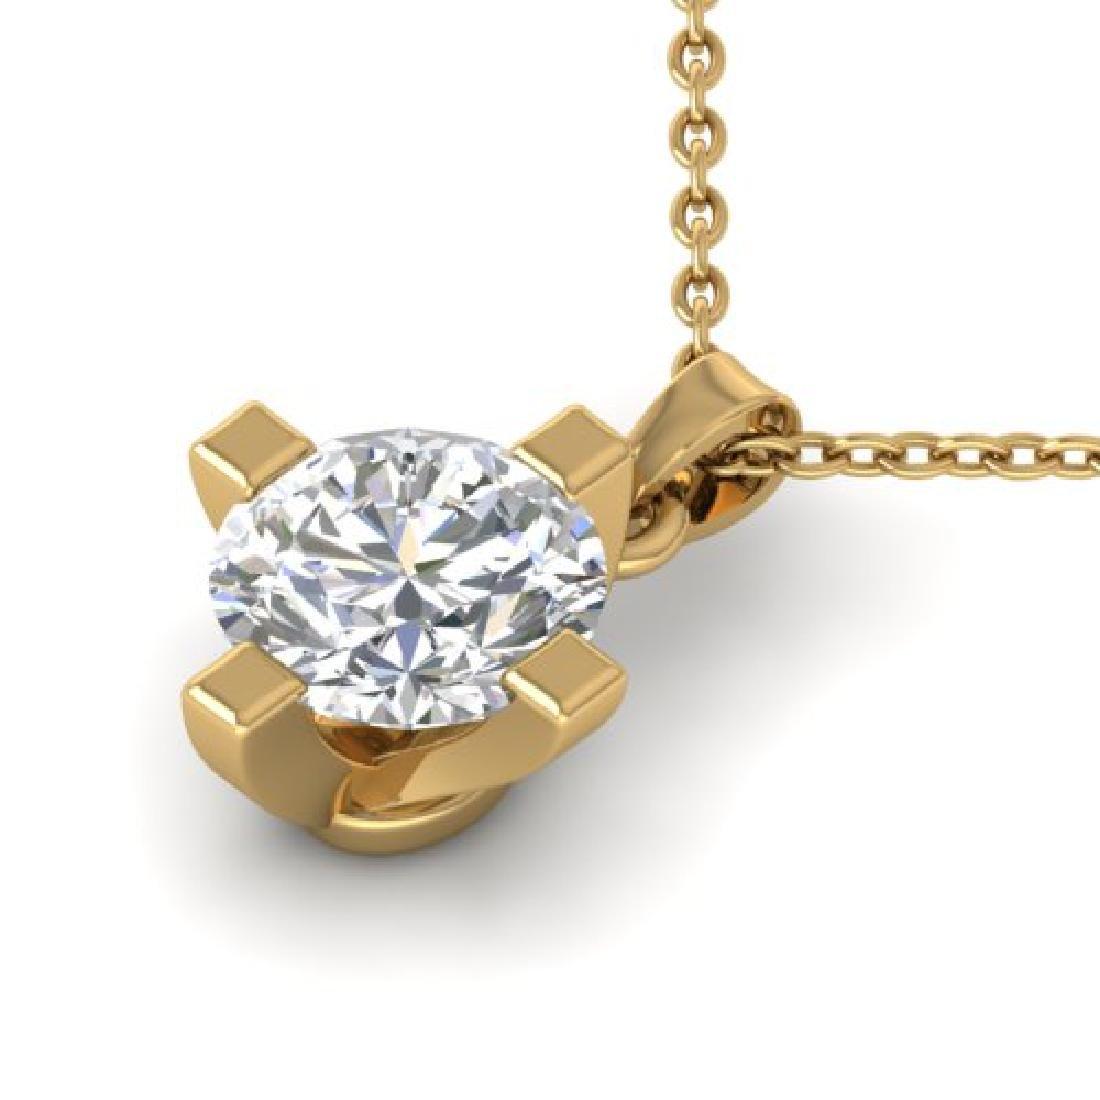 1 CTW Certified VS/SI Diamond Solitaire Necklace 18K - 2